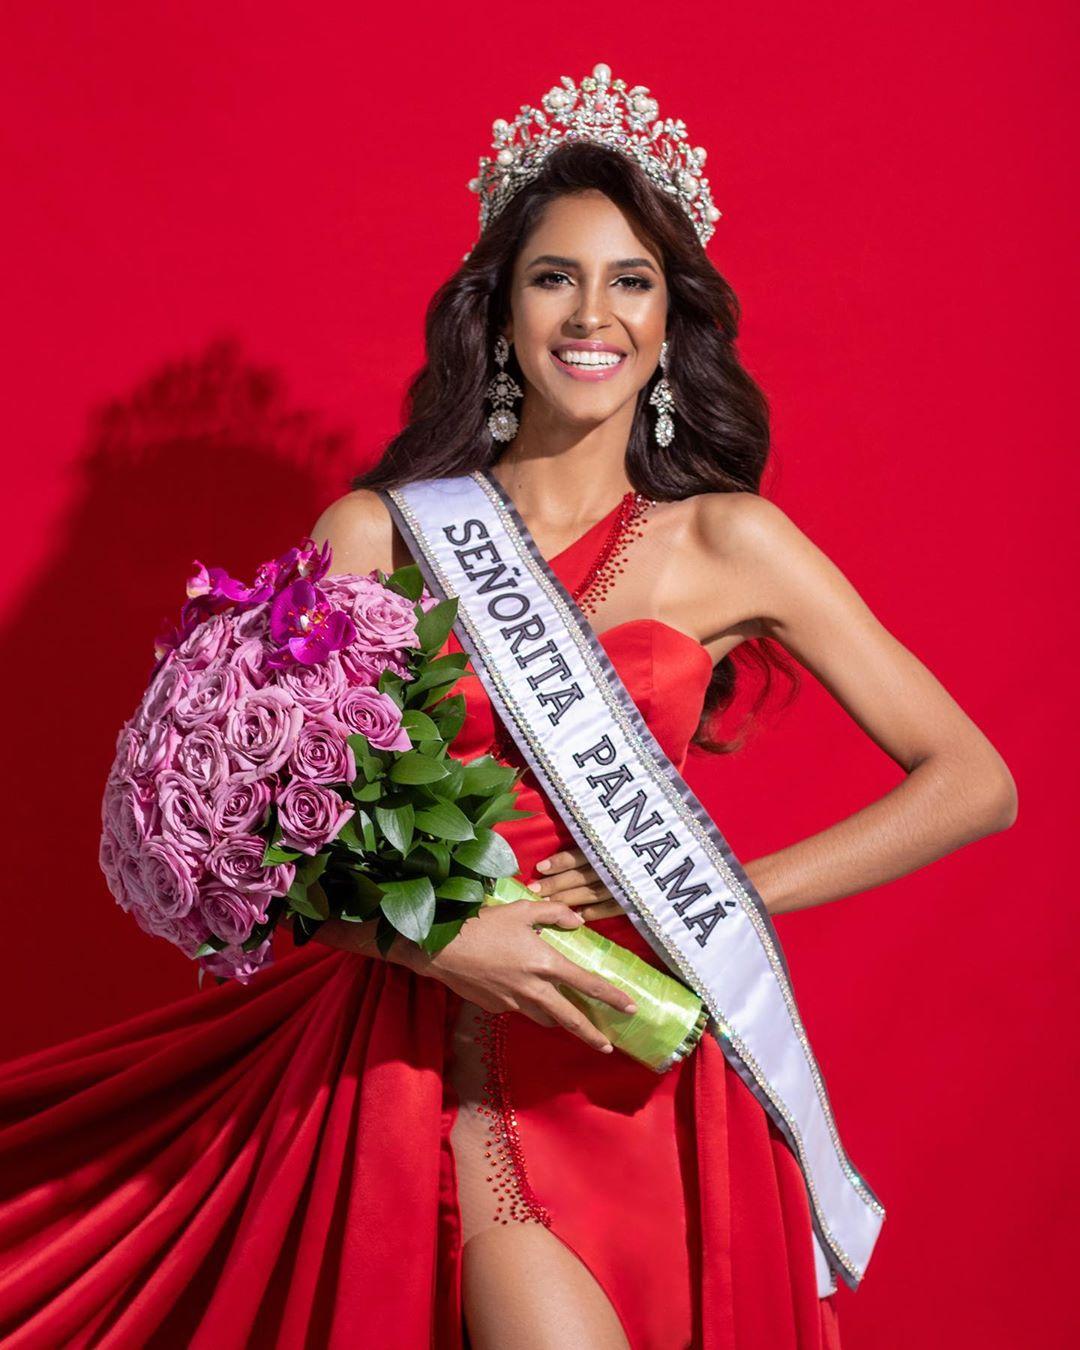 Coronan oficialmente a la nueva Señorita Panamá 2020, Carmen Jaramillo Rhk3kmrh